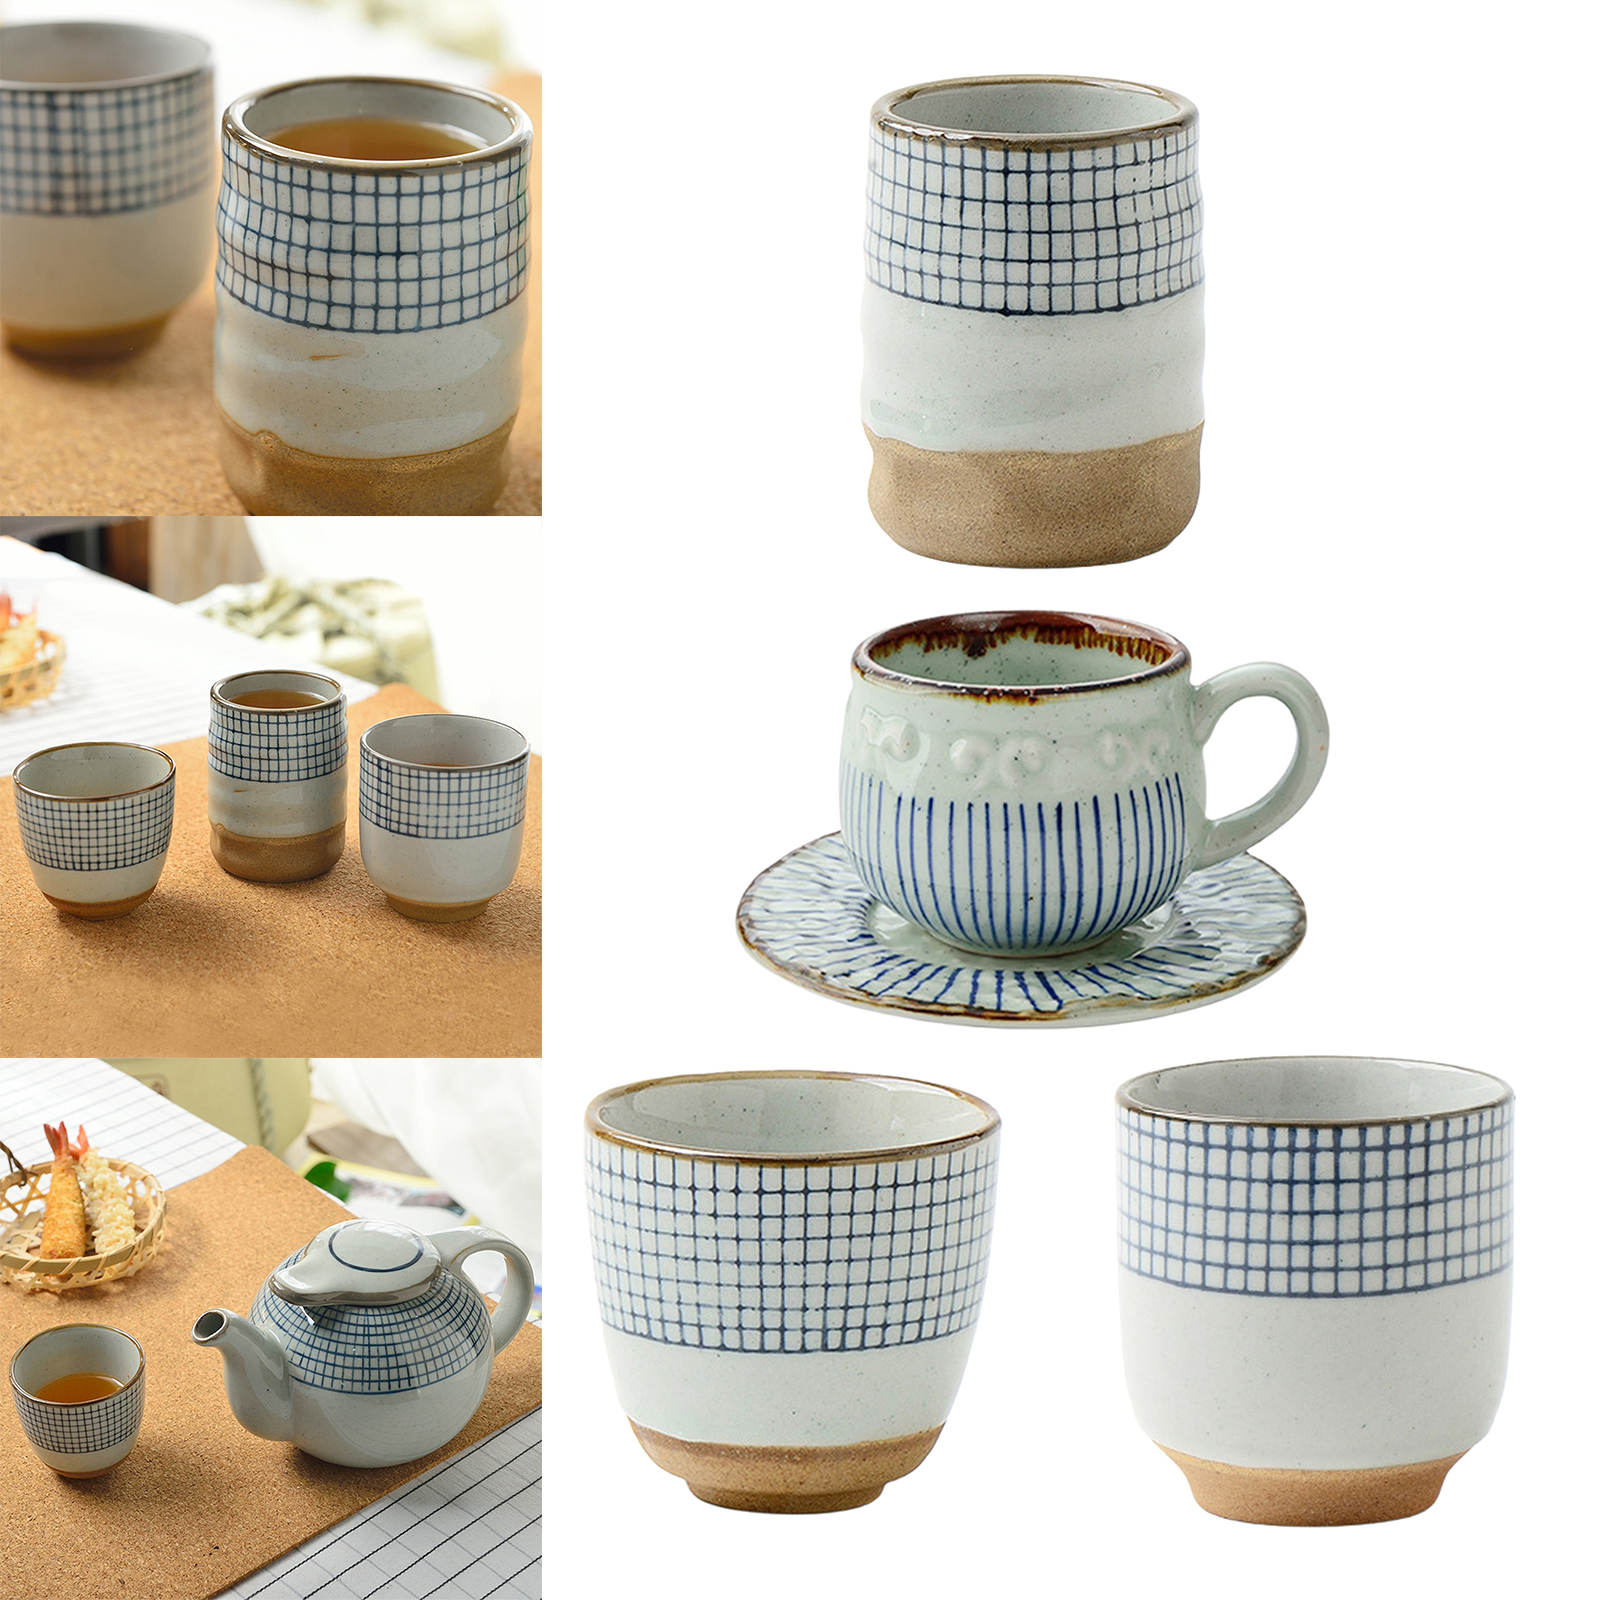 Teaware Japanese Yunomi Teacup Ceramic Tea Cup Handcraft Coffee Mug Cup for Coffee Table Decor